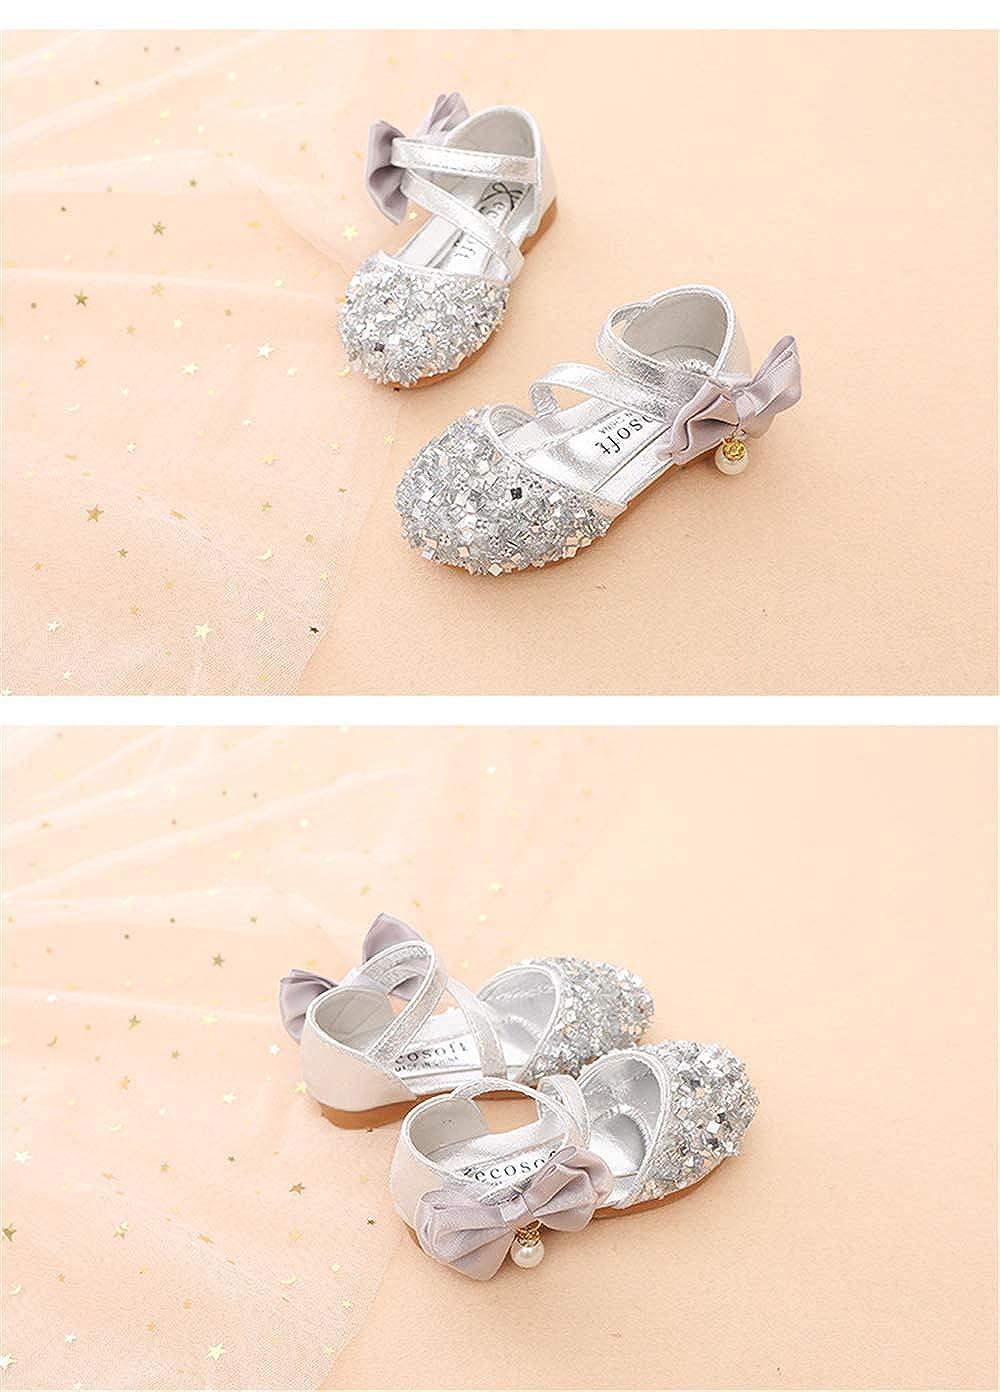 MaxTide Low Heel Sandals for Girls Light Blue Toddler Wedding Dress Shoes Size 11 Princess Sequin Little Girls Cute Rhinestone